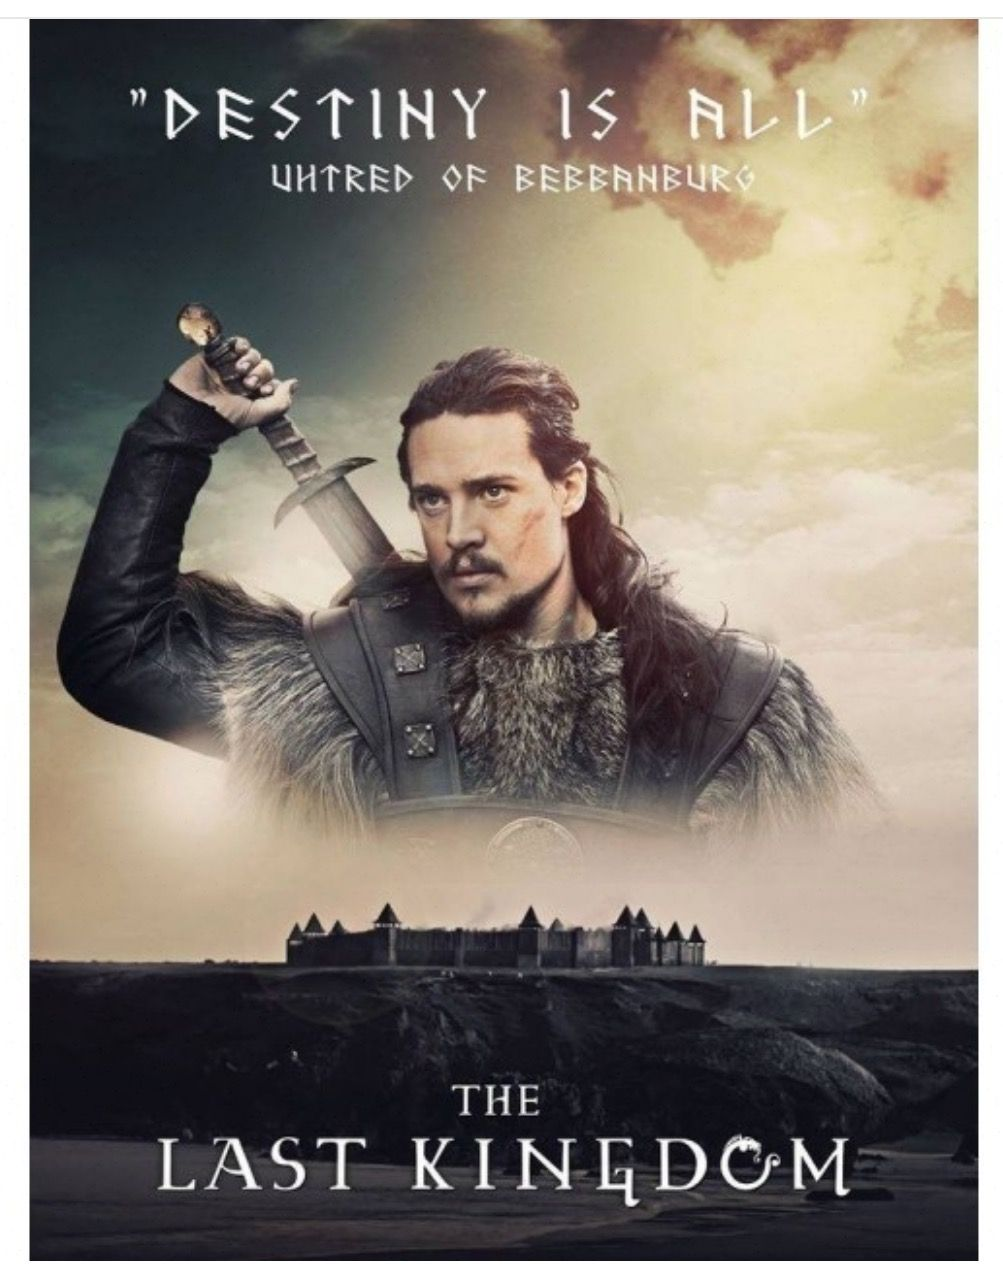 If you like GoT, watch The Last Kingdom. Just binged